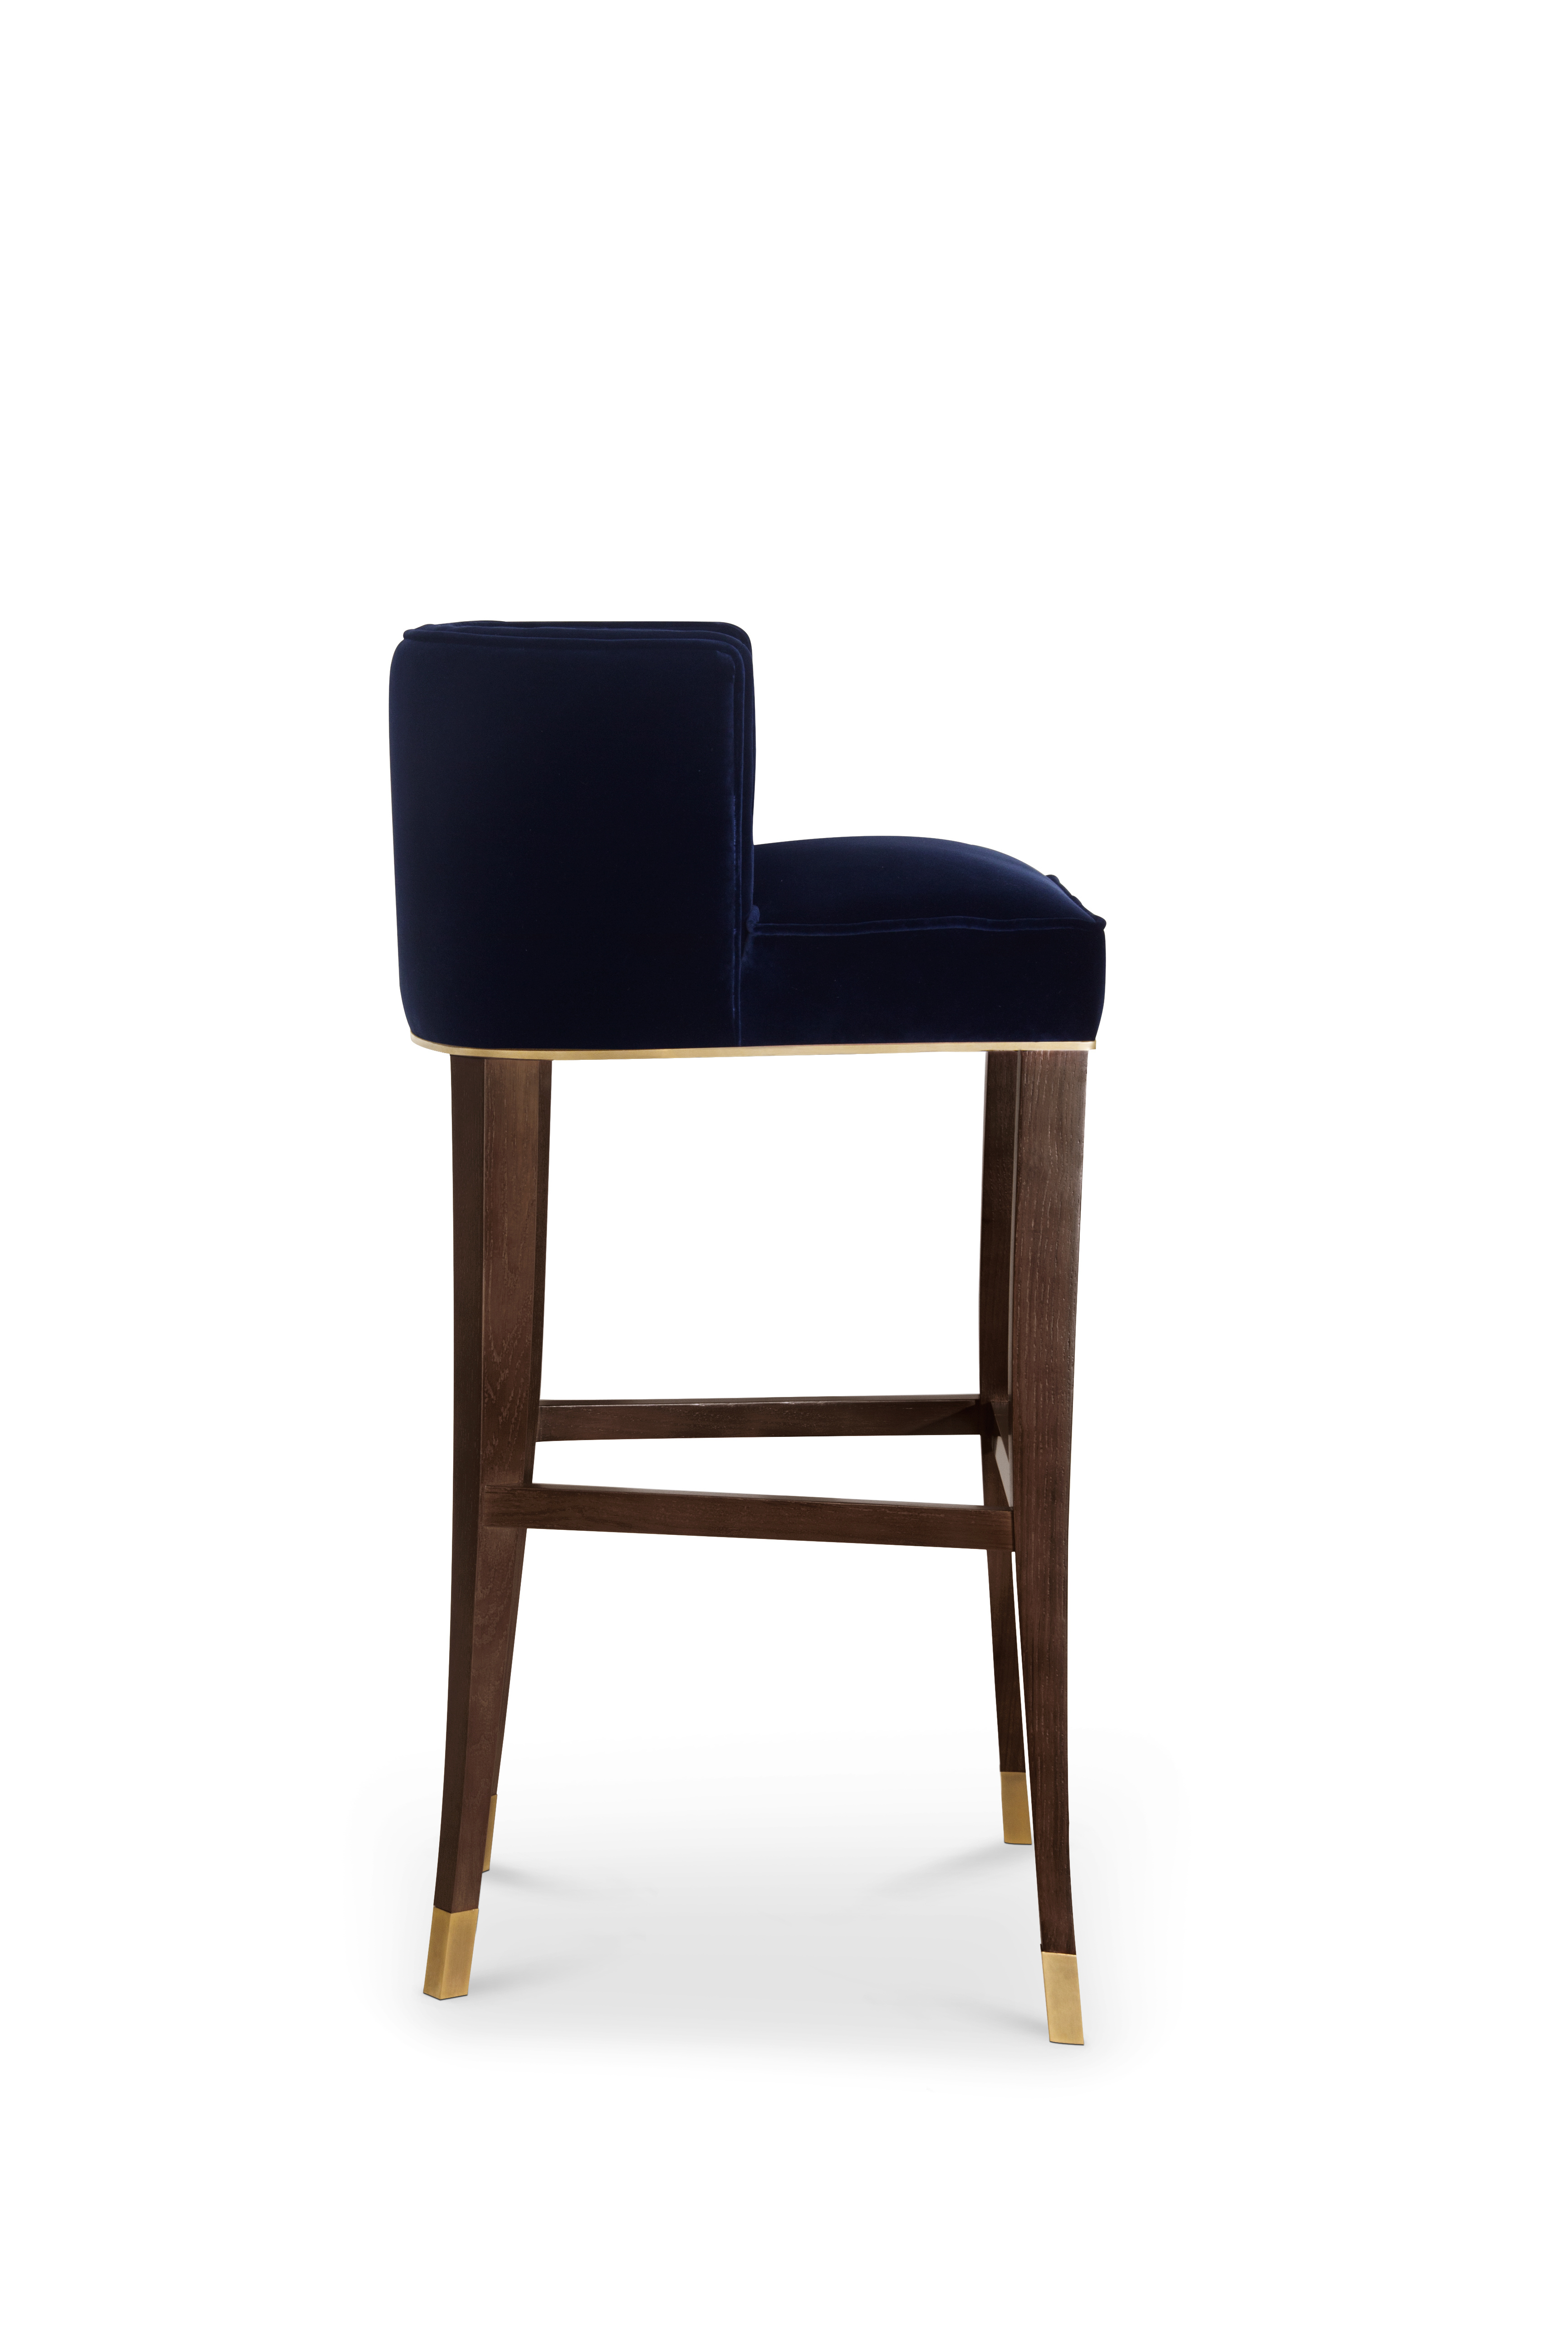 BOURBON Bar Chair Mid Century Design by BRABBU : bourbon bar chair 3 HR from www.brabbu.com size 3456 x 5184 jpeg 2315kB